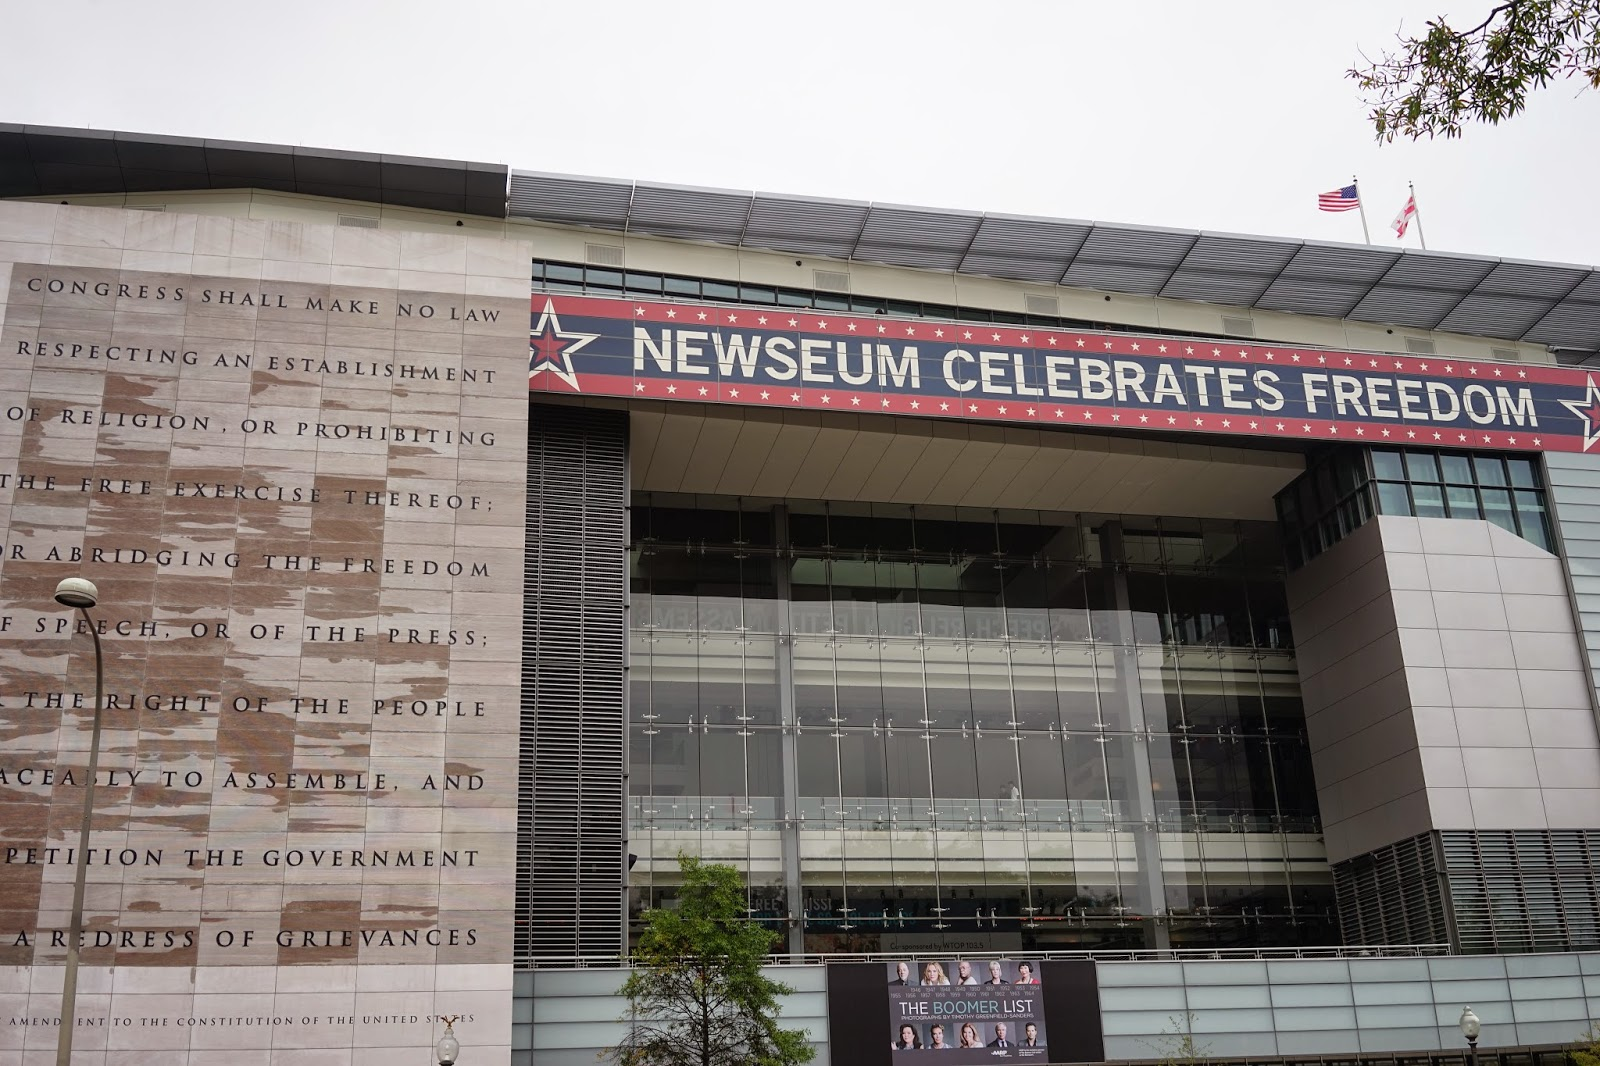 newseum washington d.c